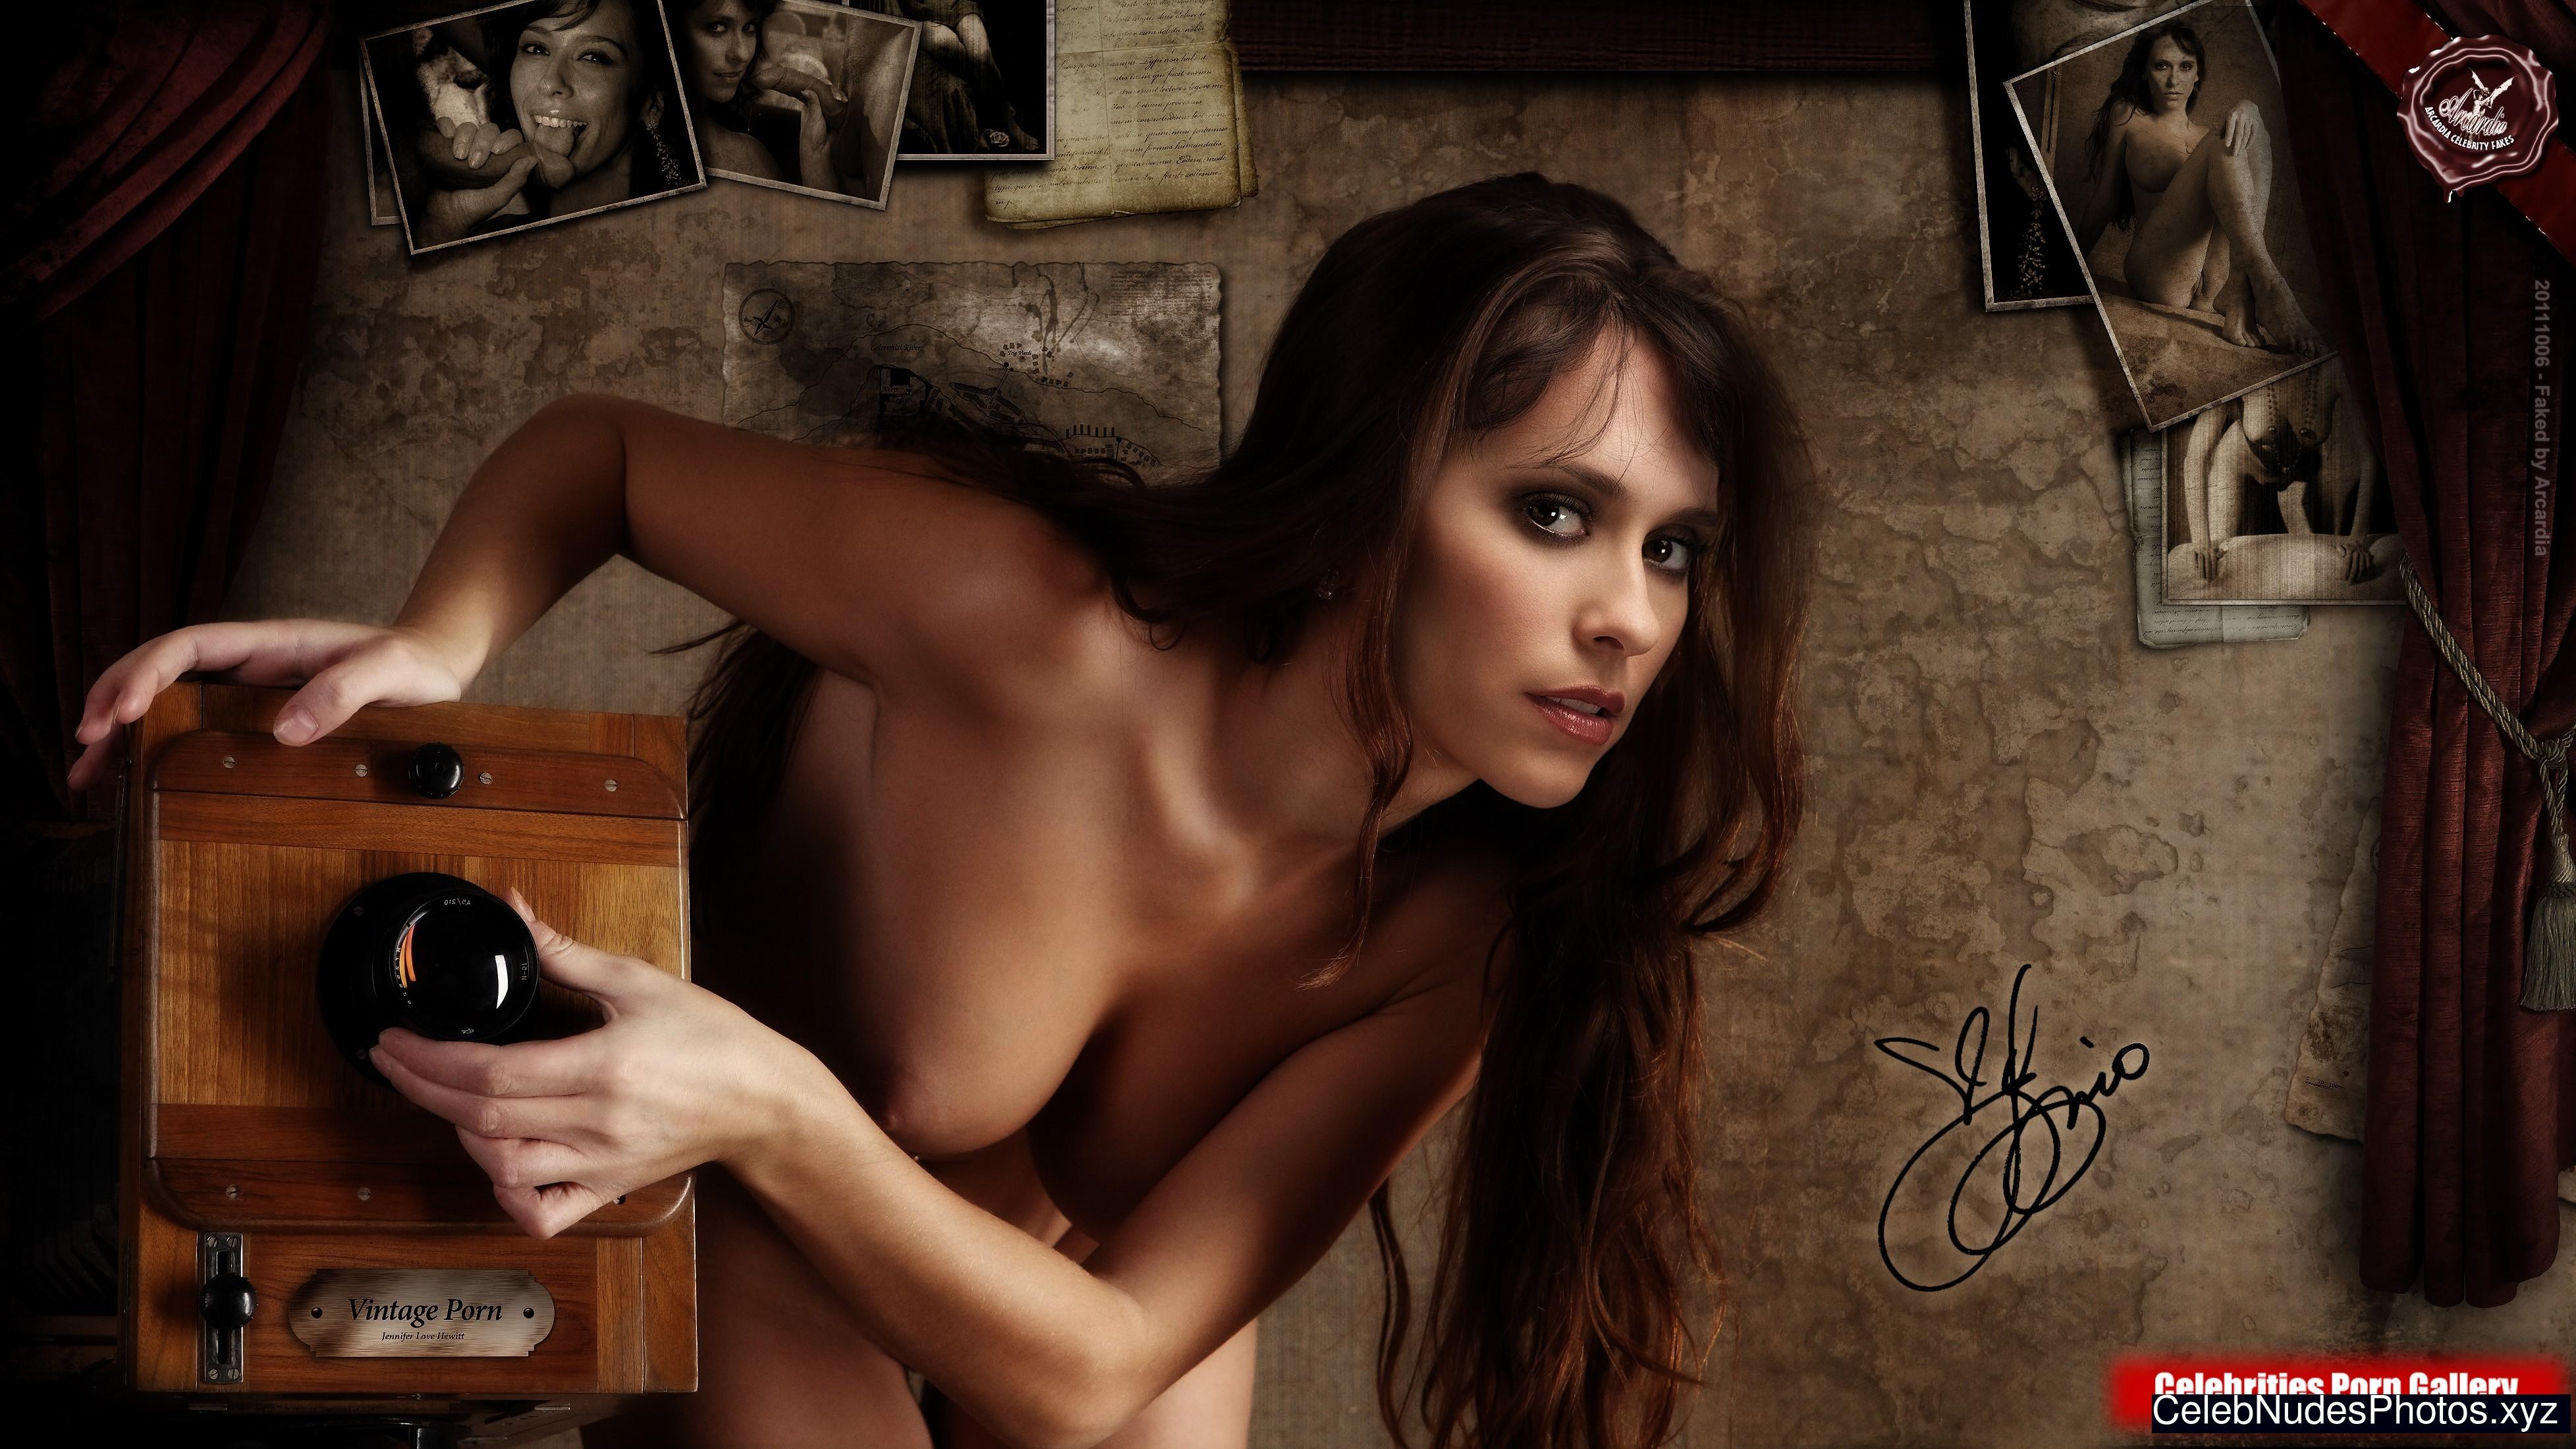 jennifer hewitt nude